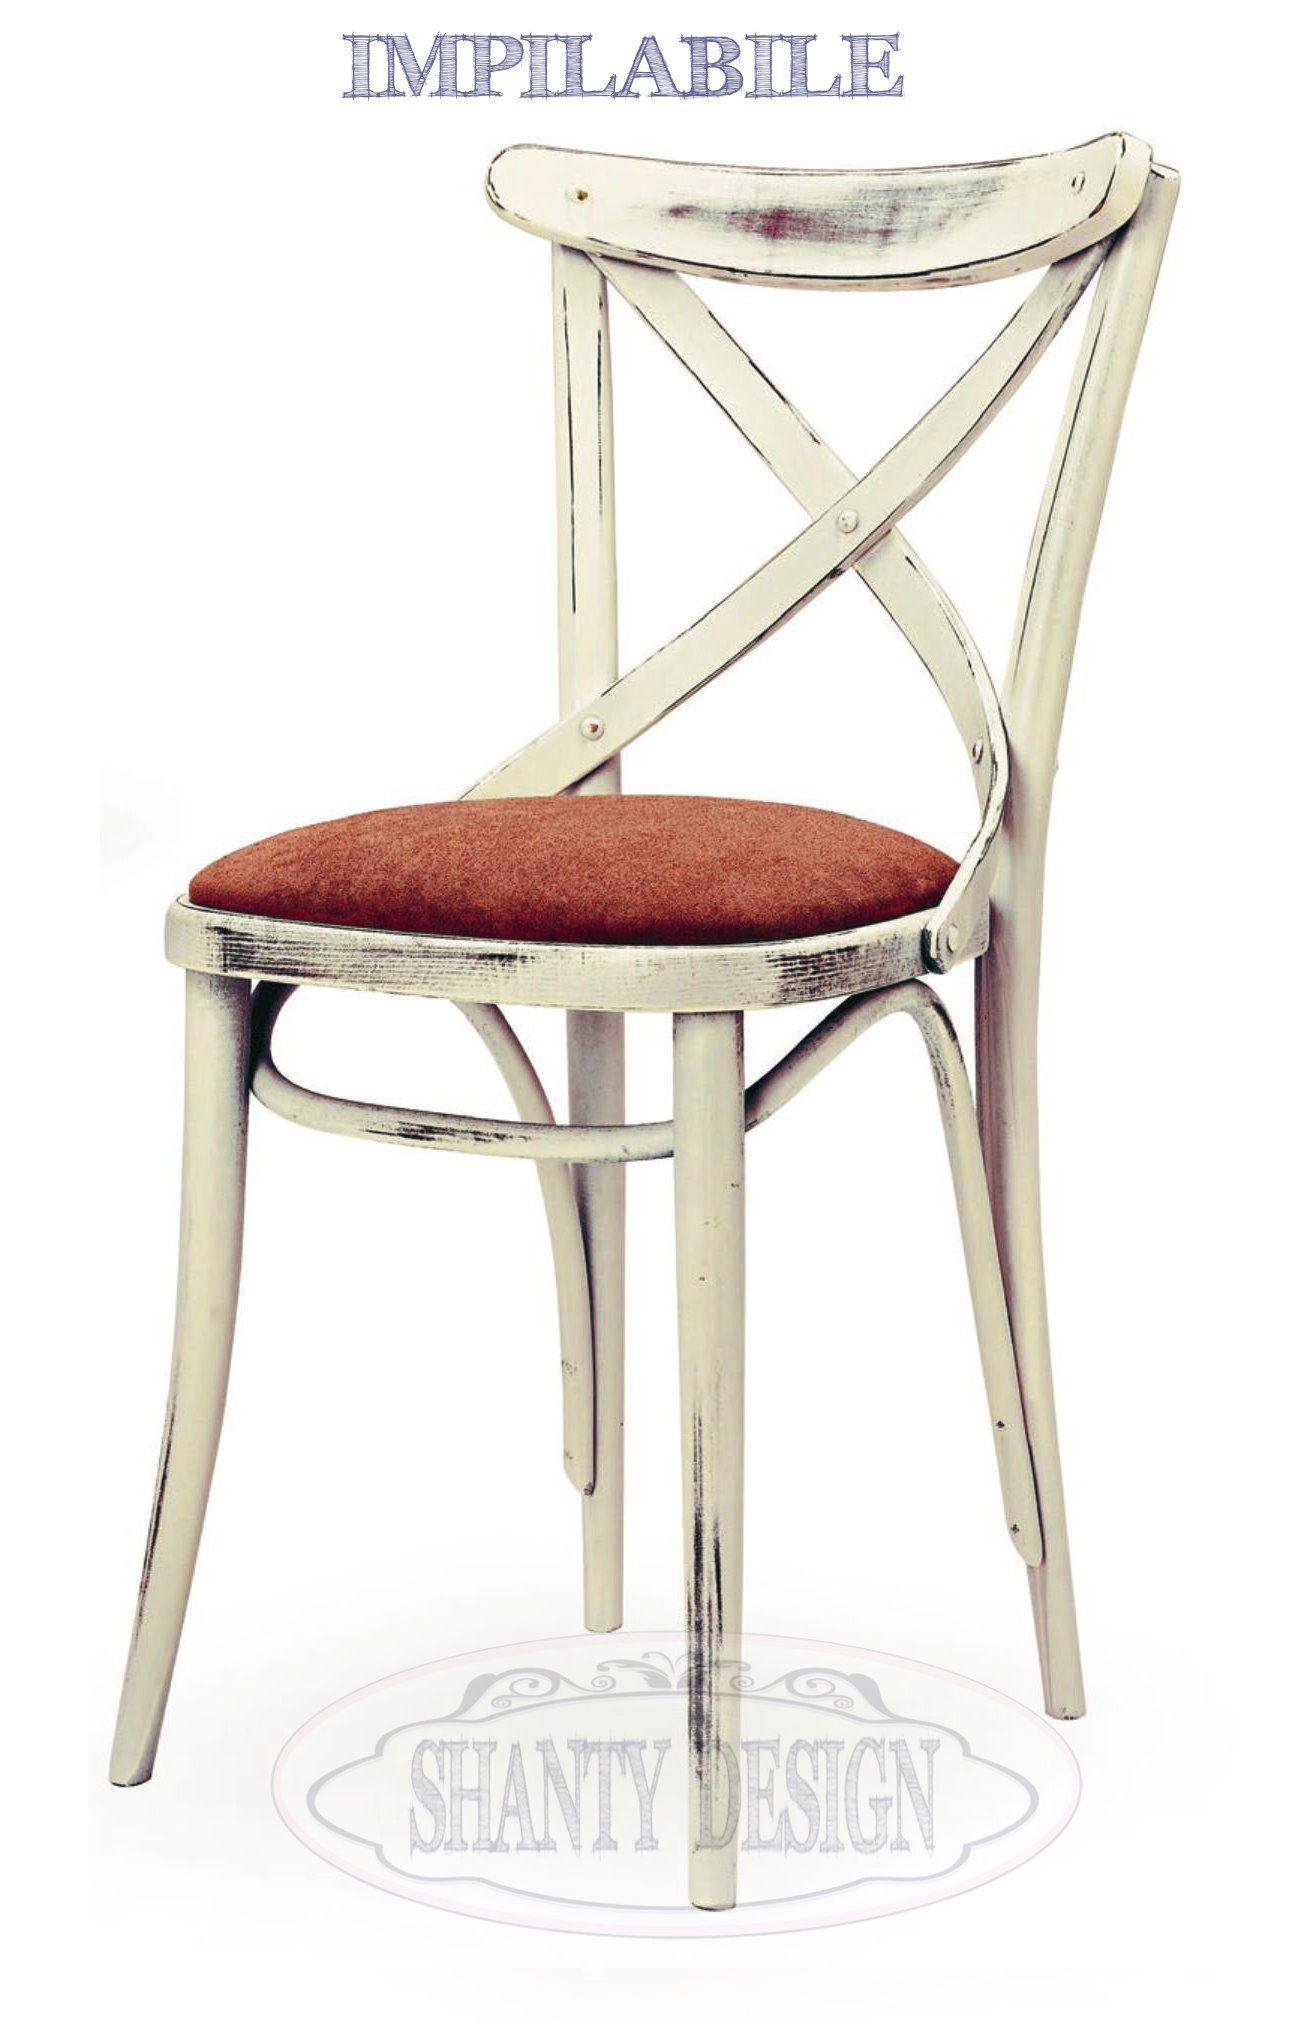 sedia provenzale roma 6 sedie shabby chic